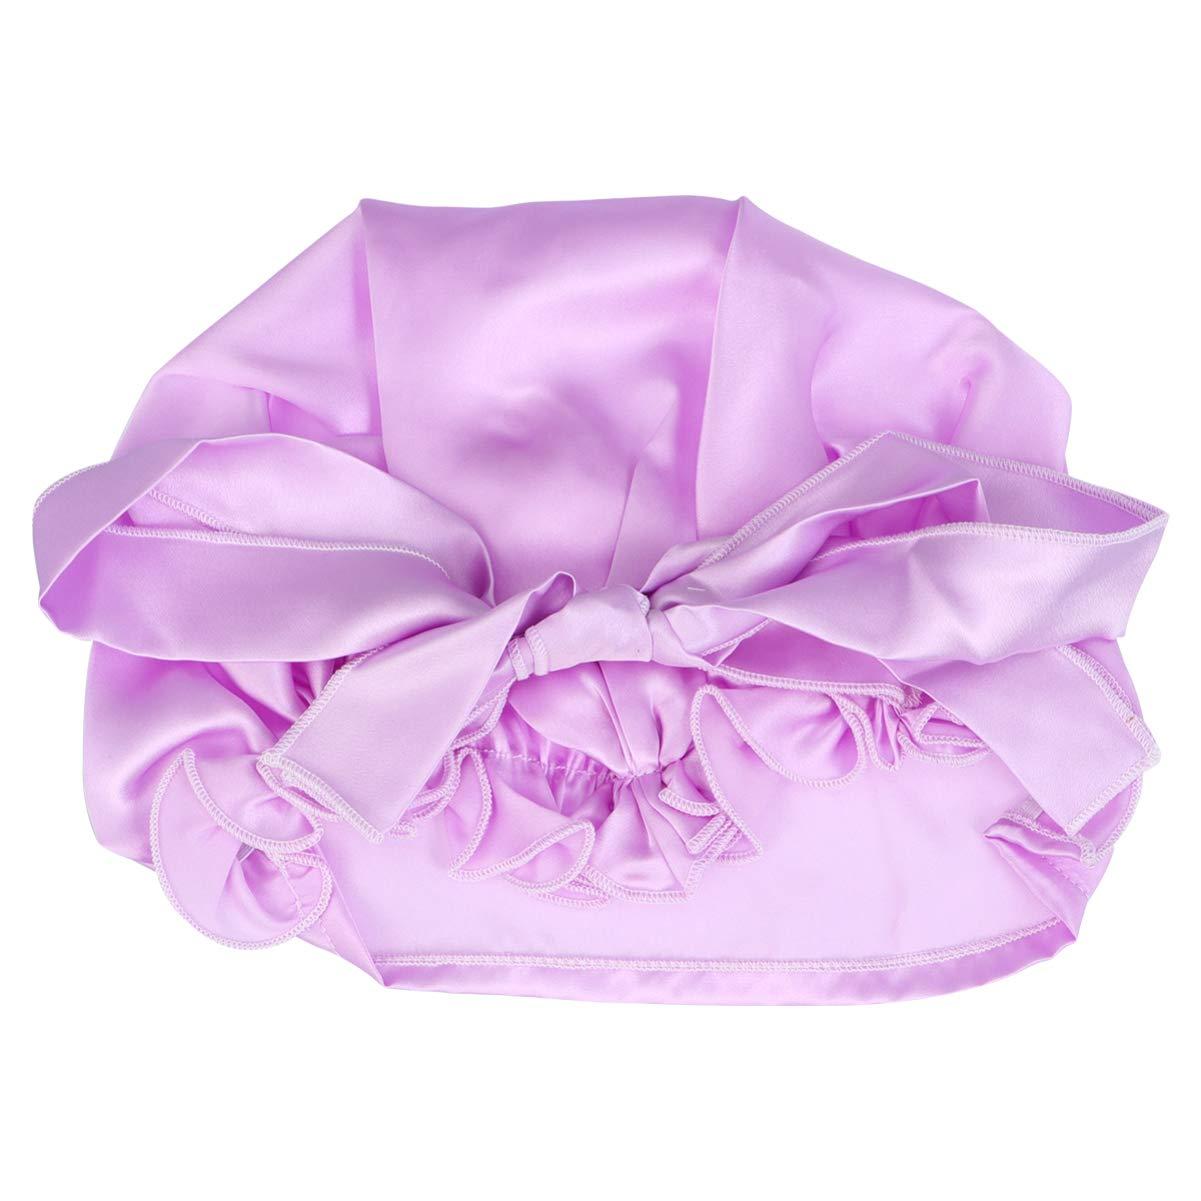 Milisten Elastic Nightcaps with Bow Adjustable Silk Sleep Night Cap Portable Dome Head Cover Bonnet Hat Hair Care Cap for Lady Girls Women (Light Purple)